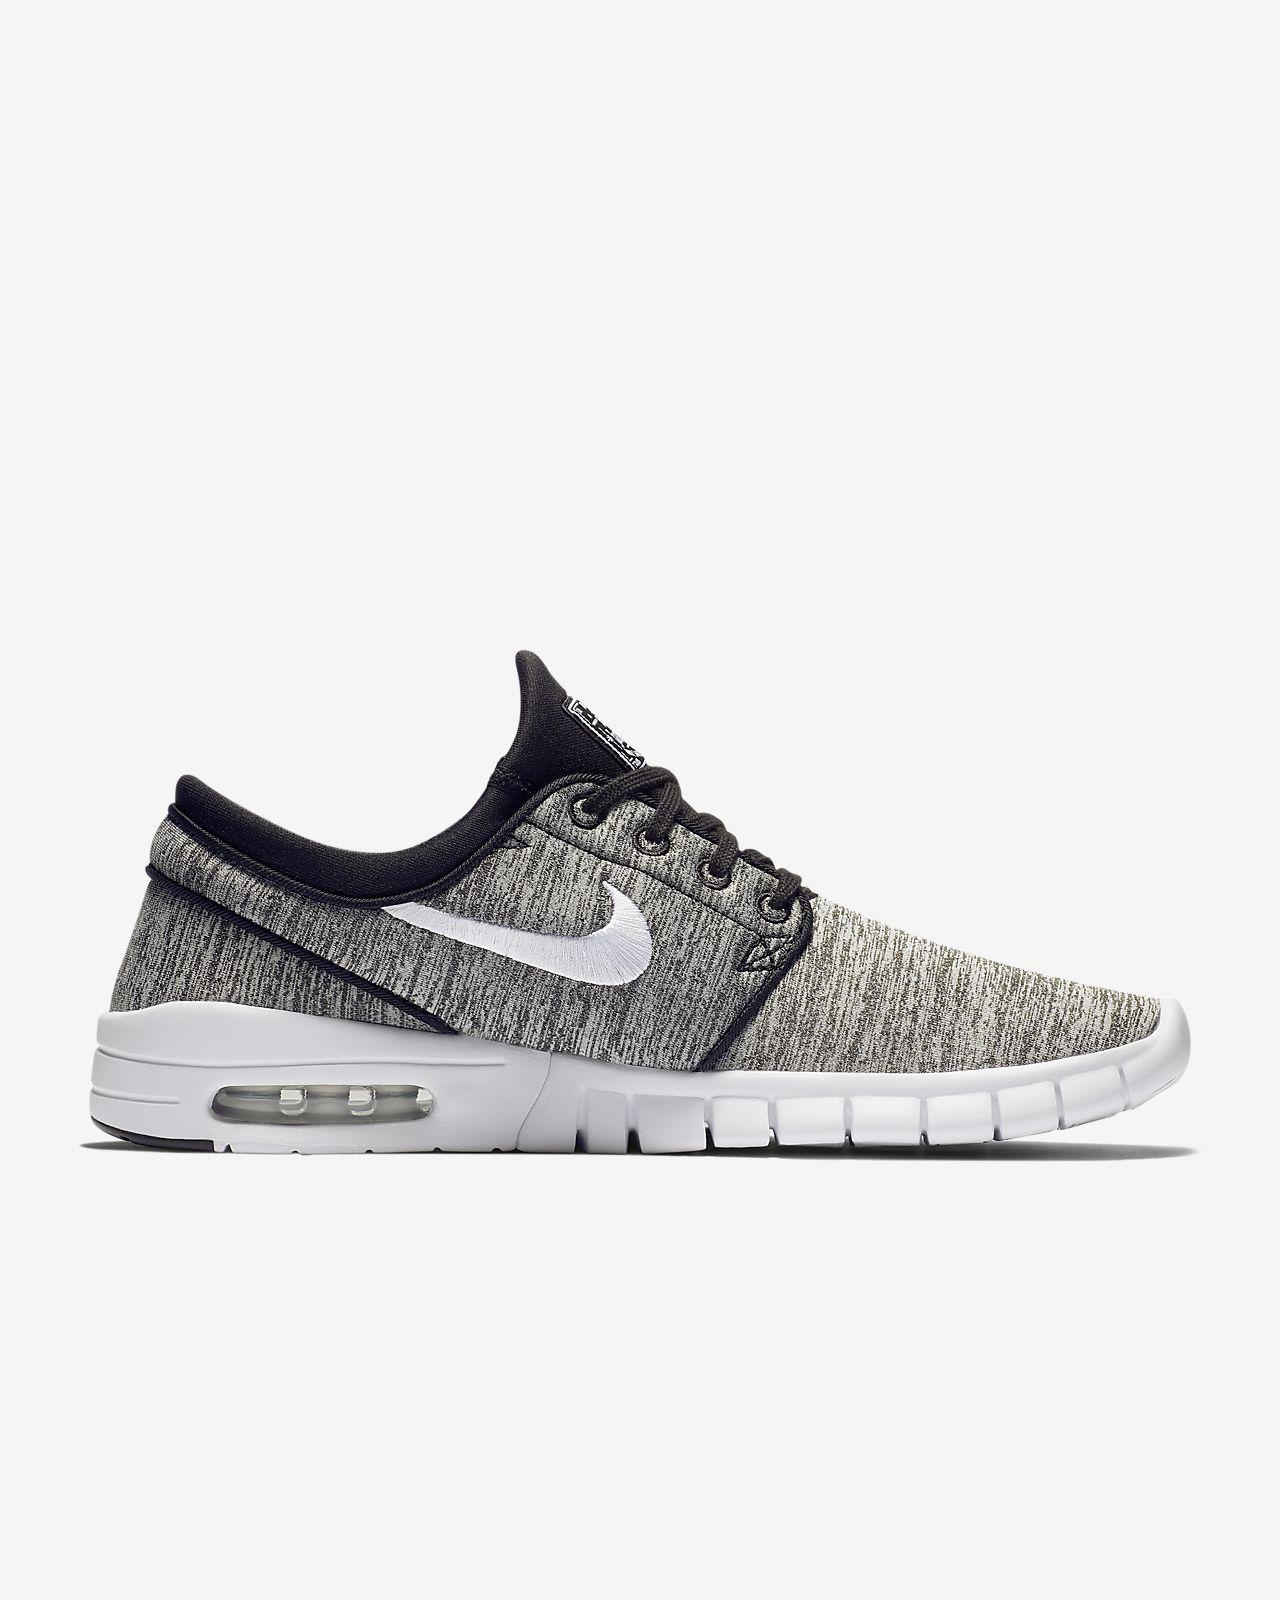 info for 5985e 3f905 ... Nike SB Stefan Janoski Max Skate Shoe